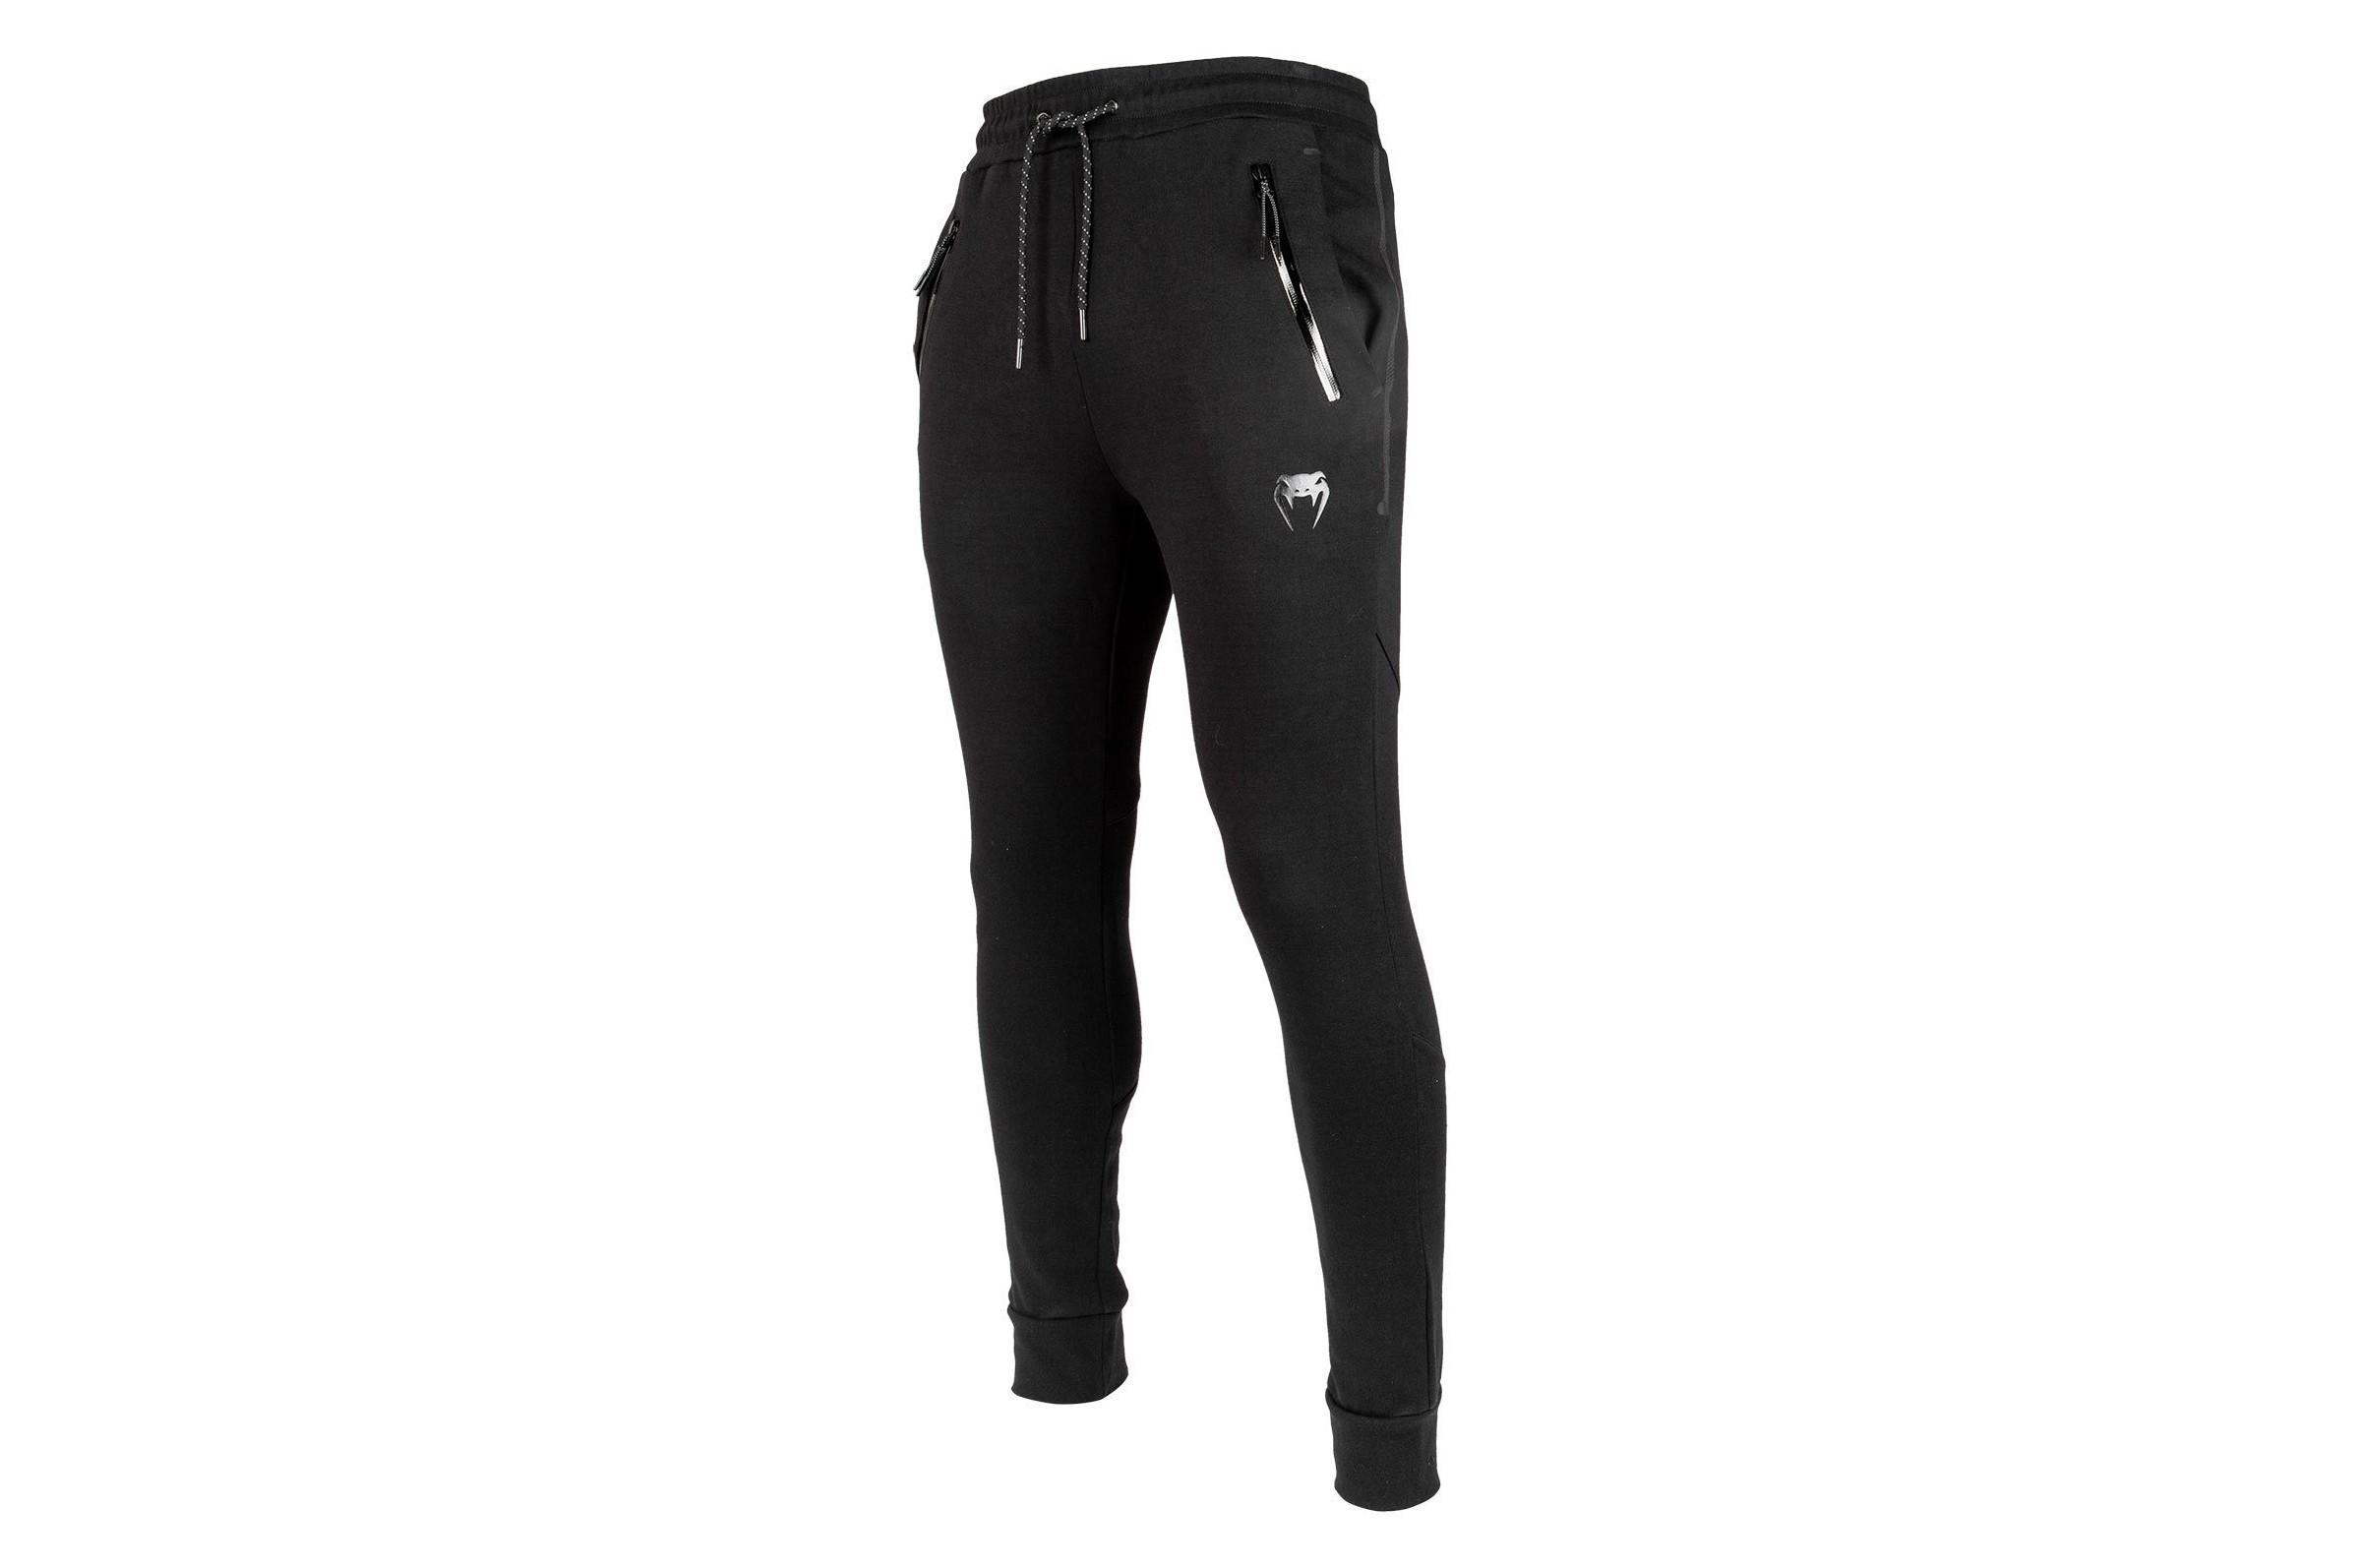 c733c9240d685 Pantalon de sport - Laser Evo, Venum - DragonSports.eu